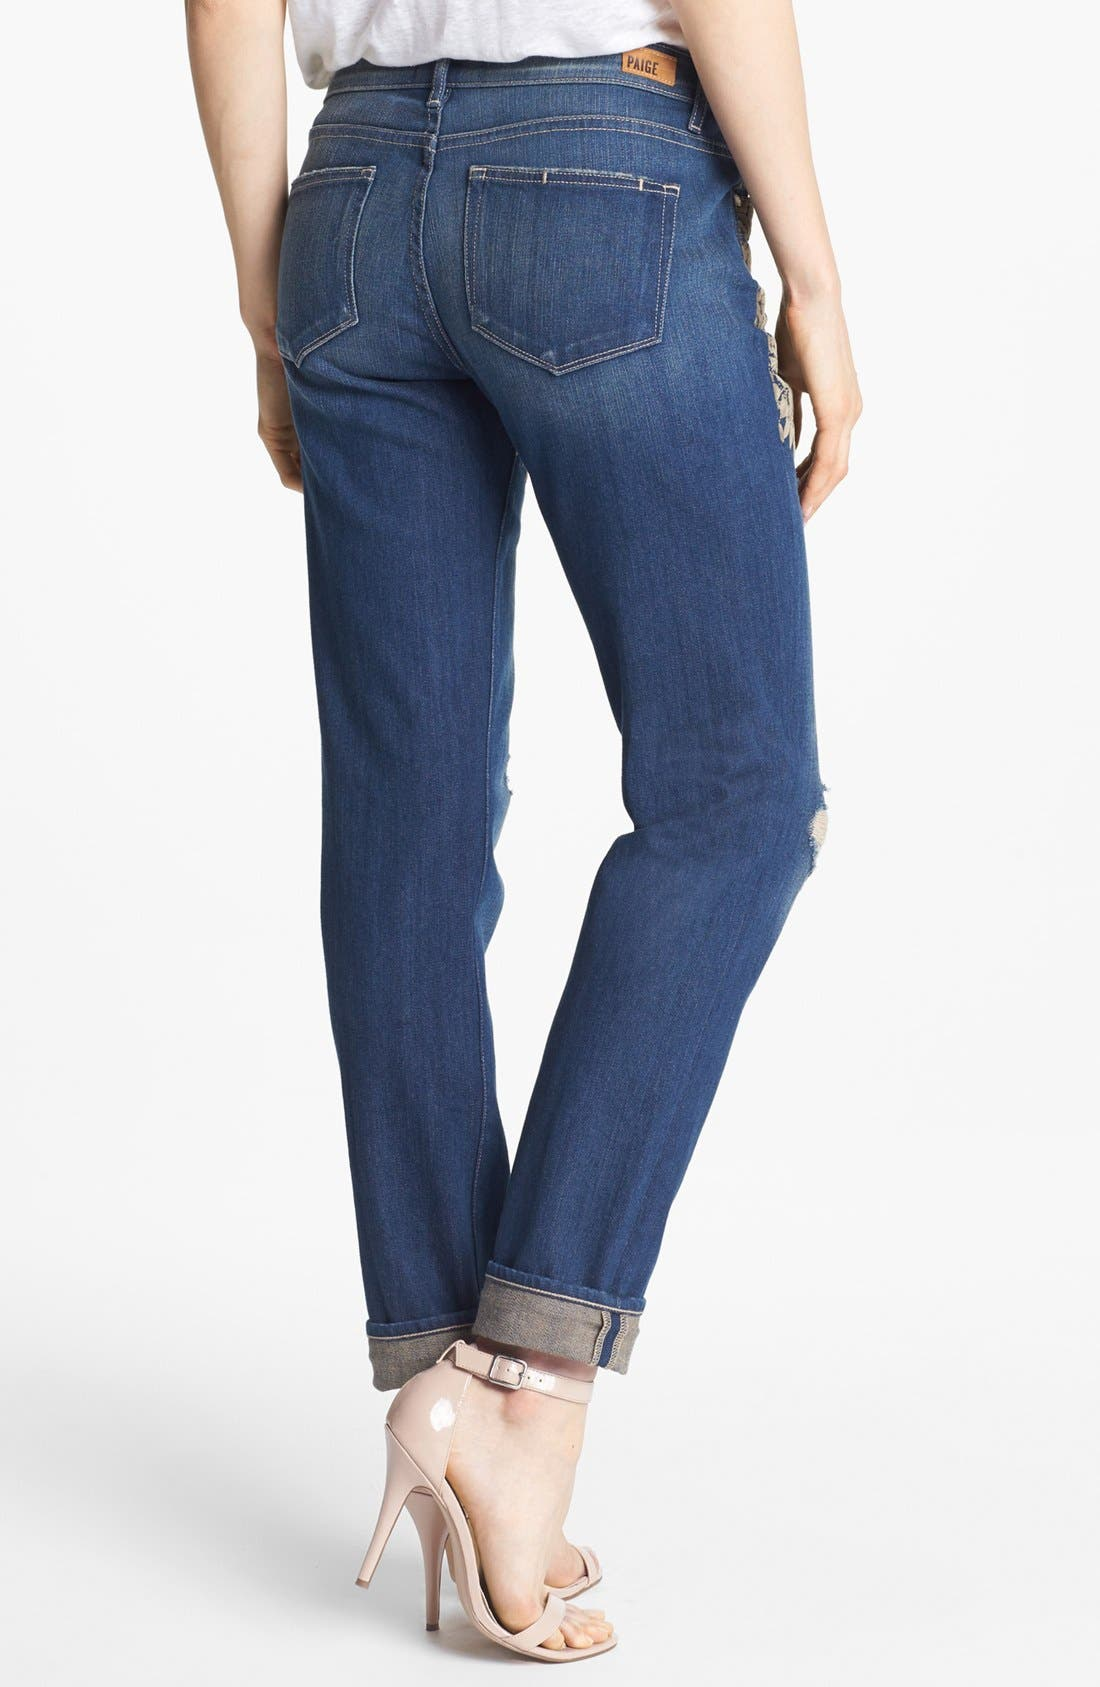 Alternate Image 2  - Paige Denim 'Jimmy Jimmy' Skinny Boyfriend Jeans (Josephine Destructed Harlequin)